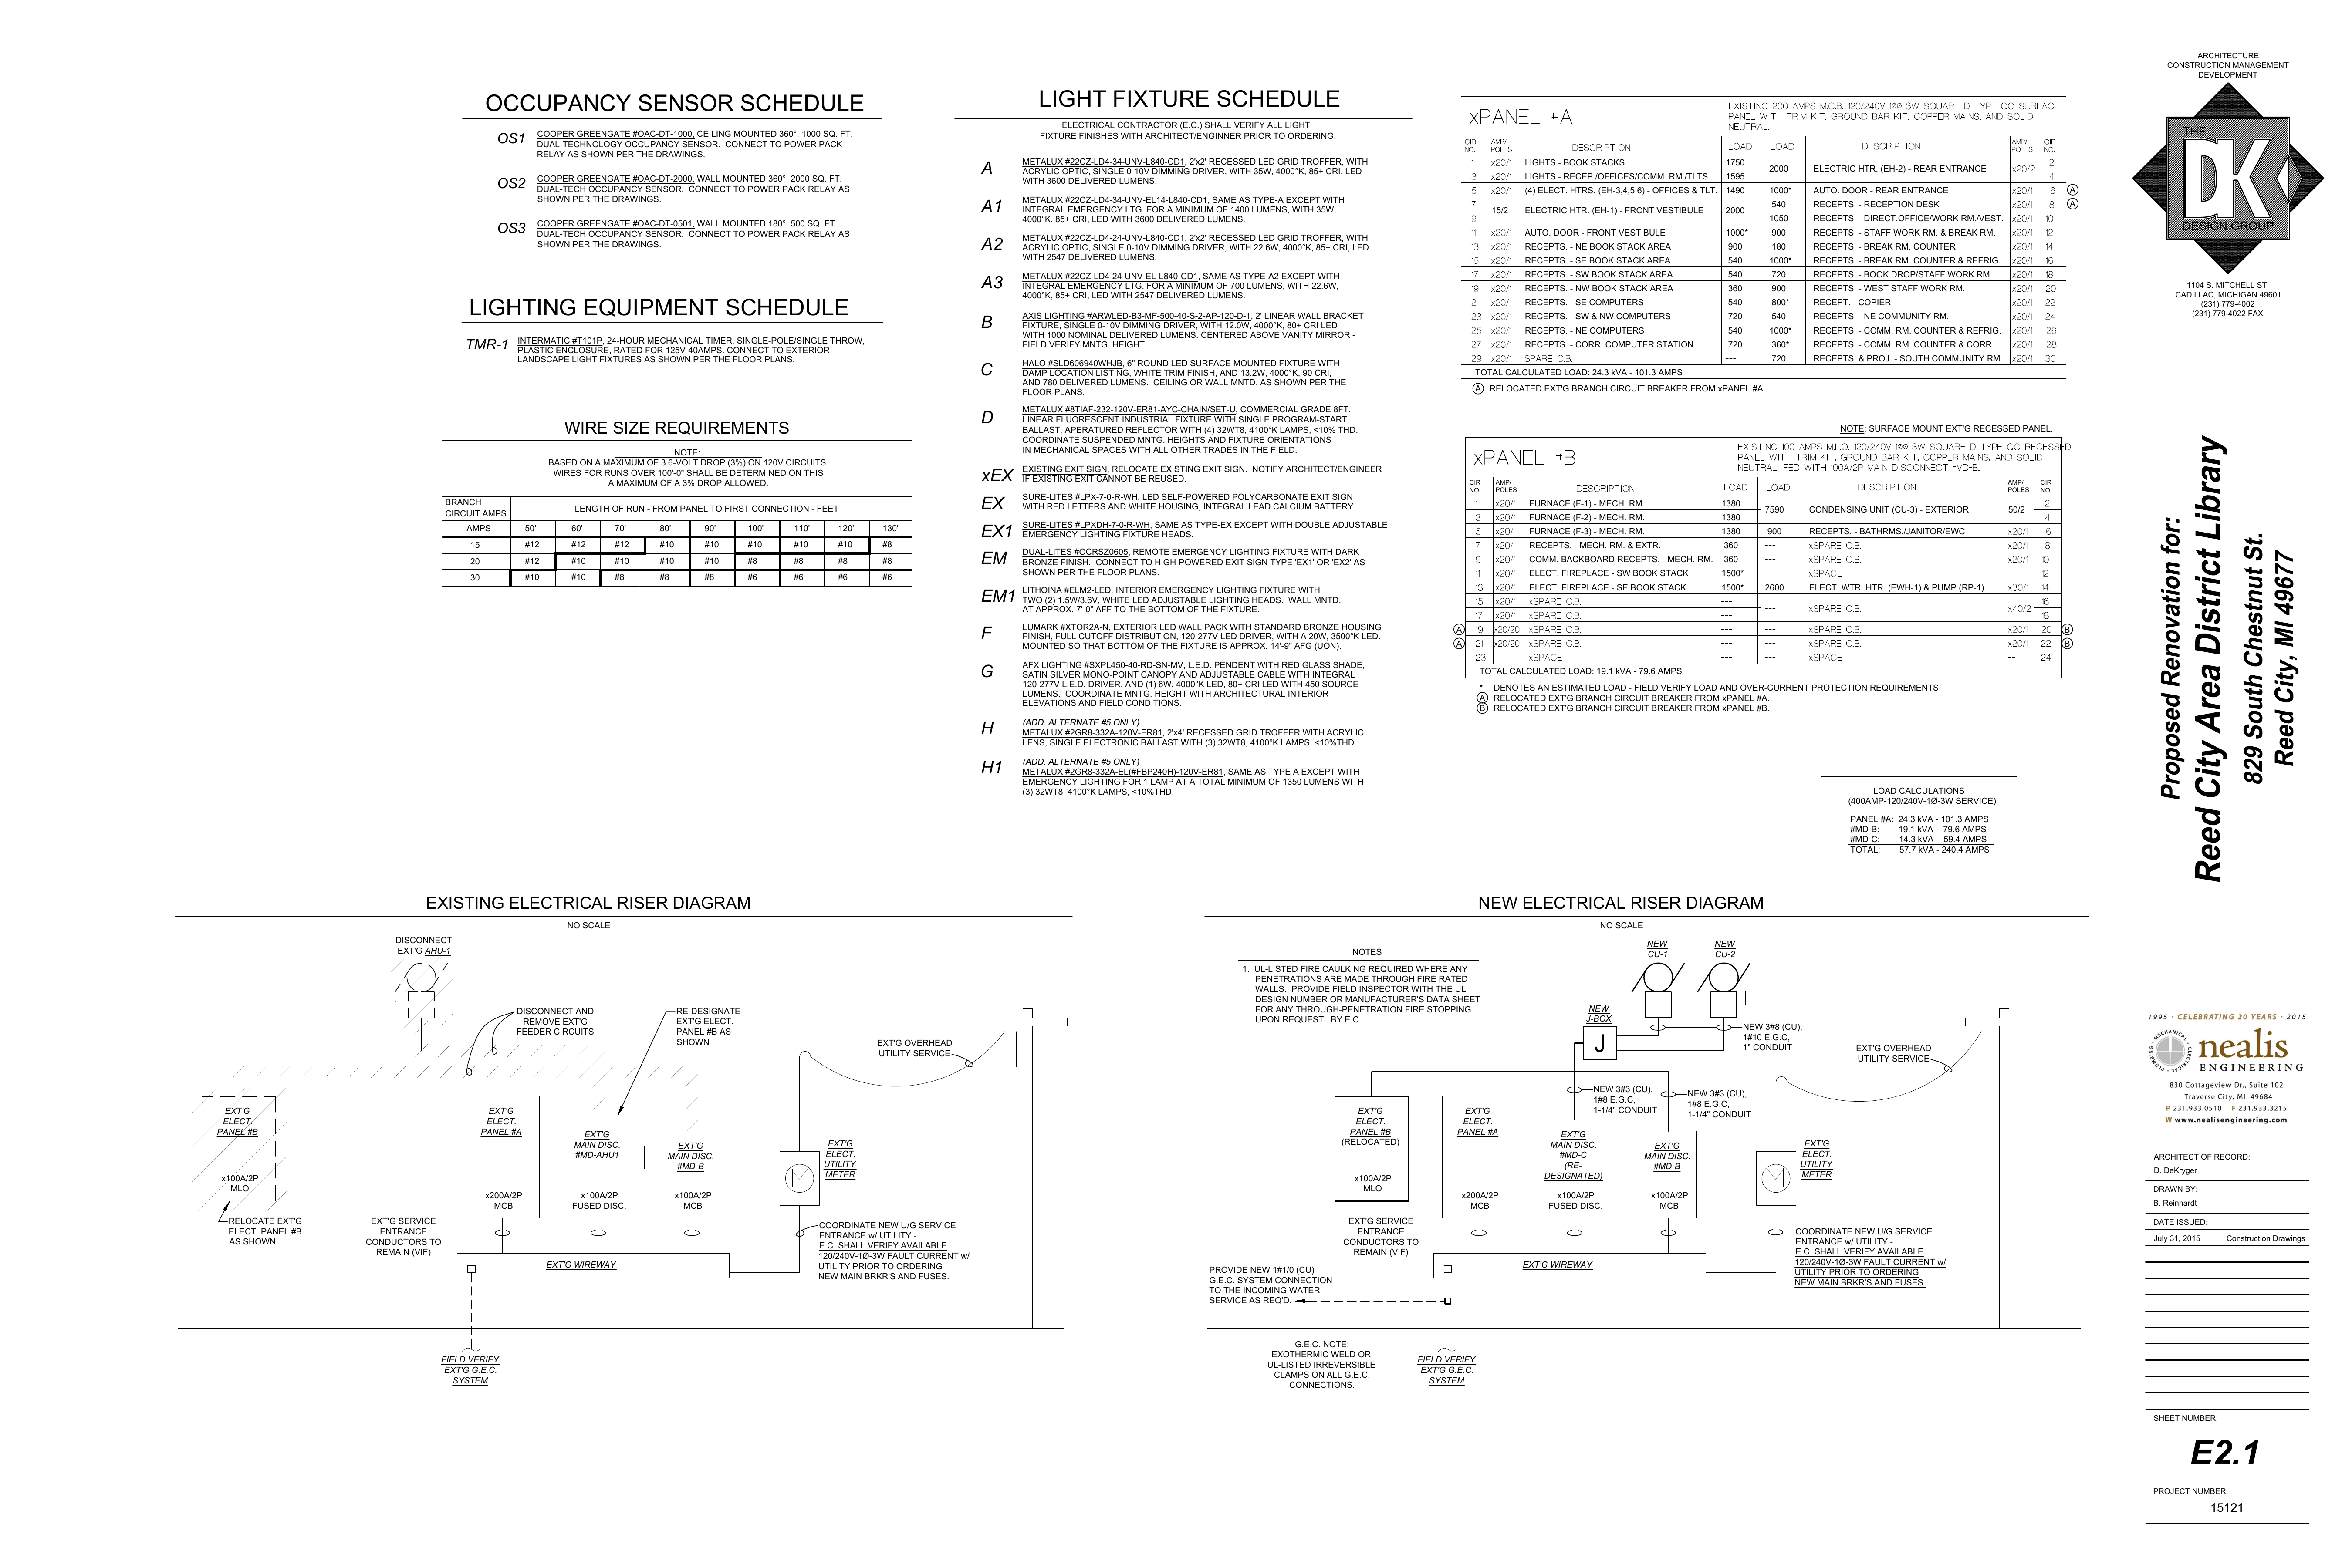 light fixture schedule lighting equipment schedule rh studylib net lighting control riser diagram